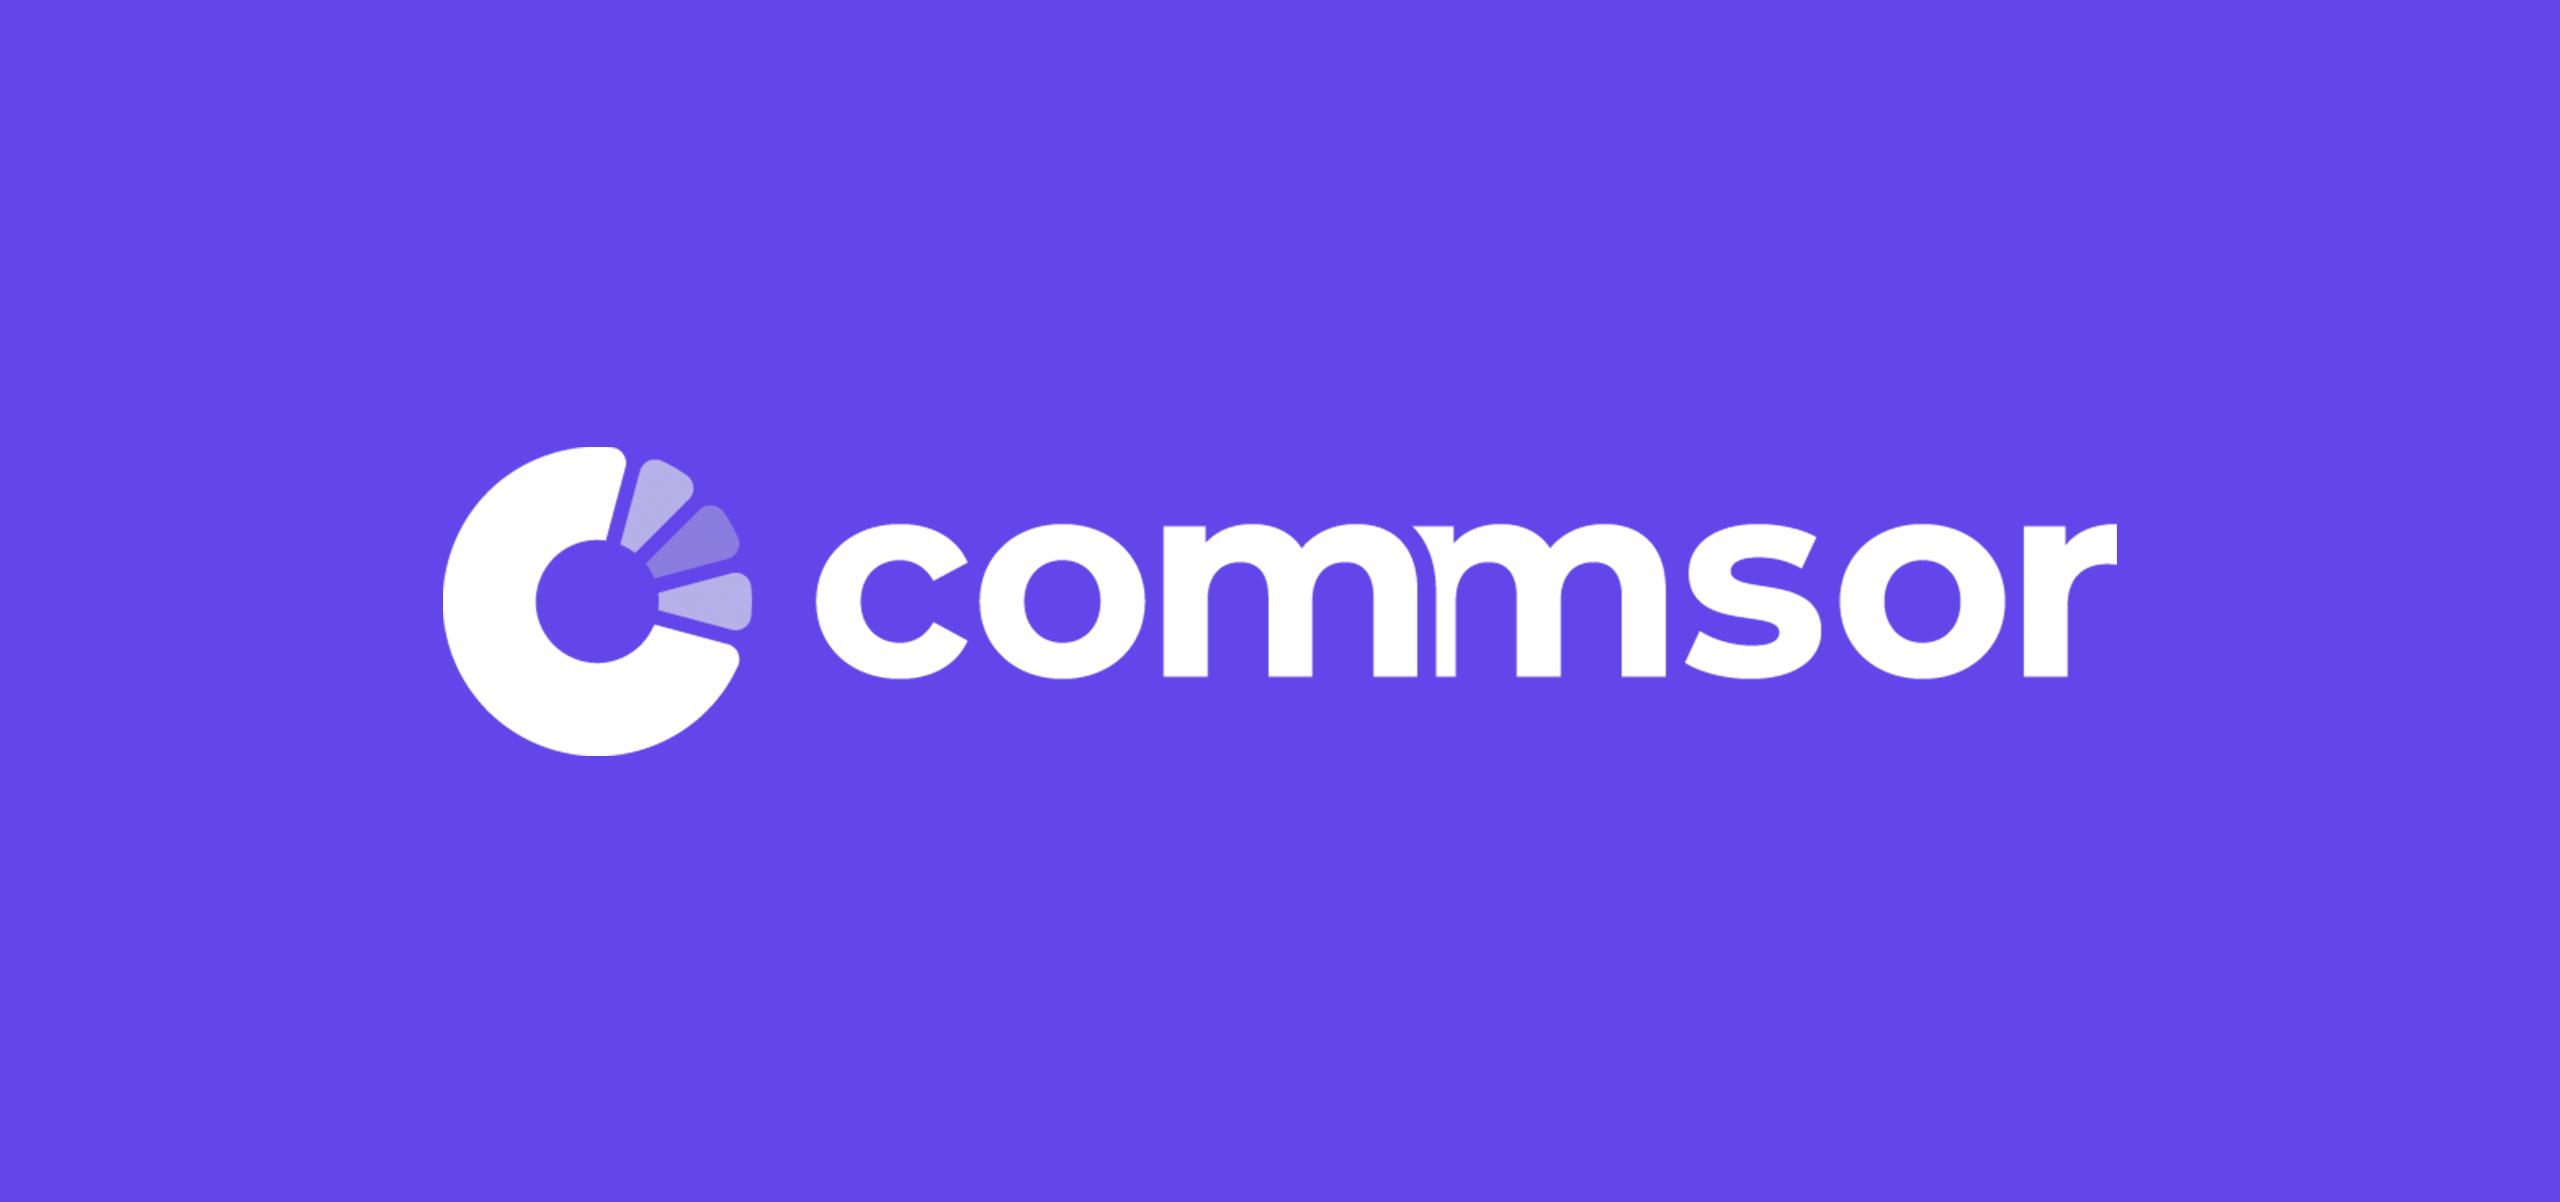 commsor.png